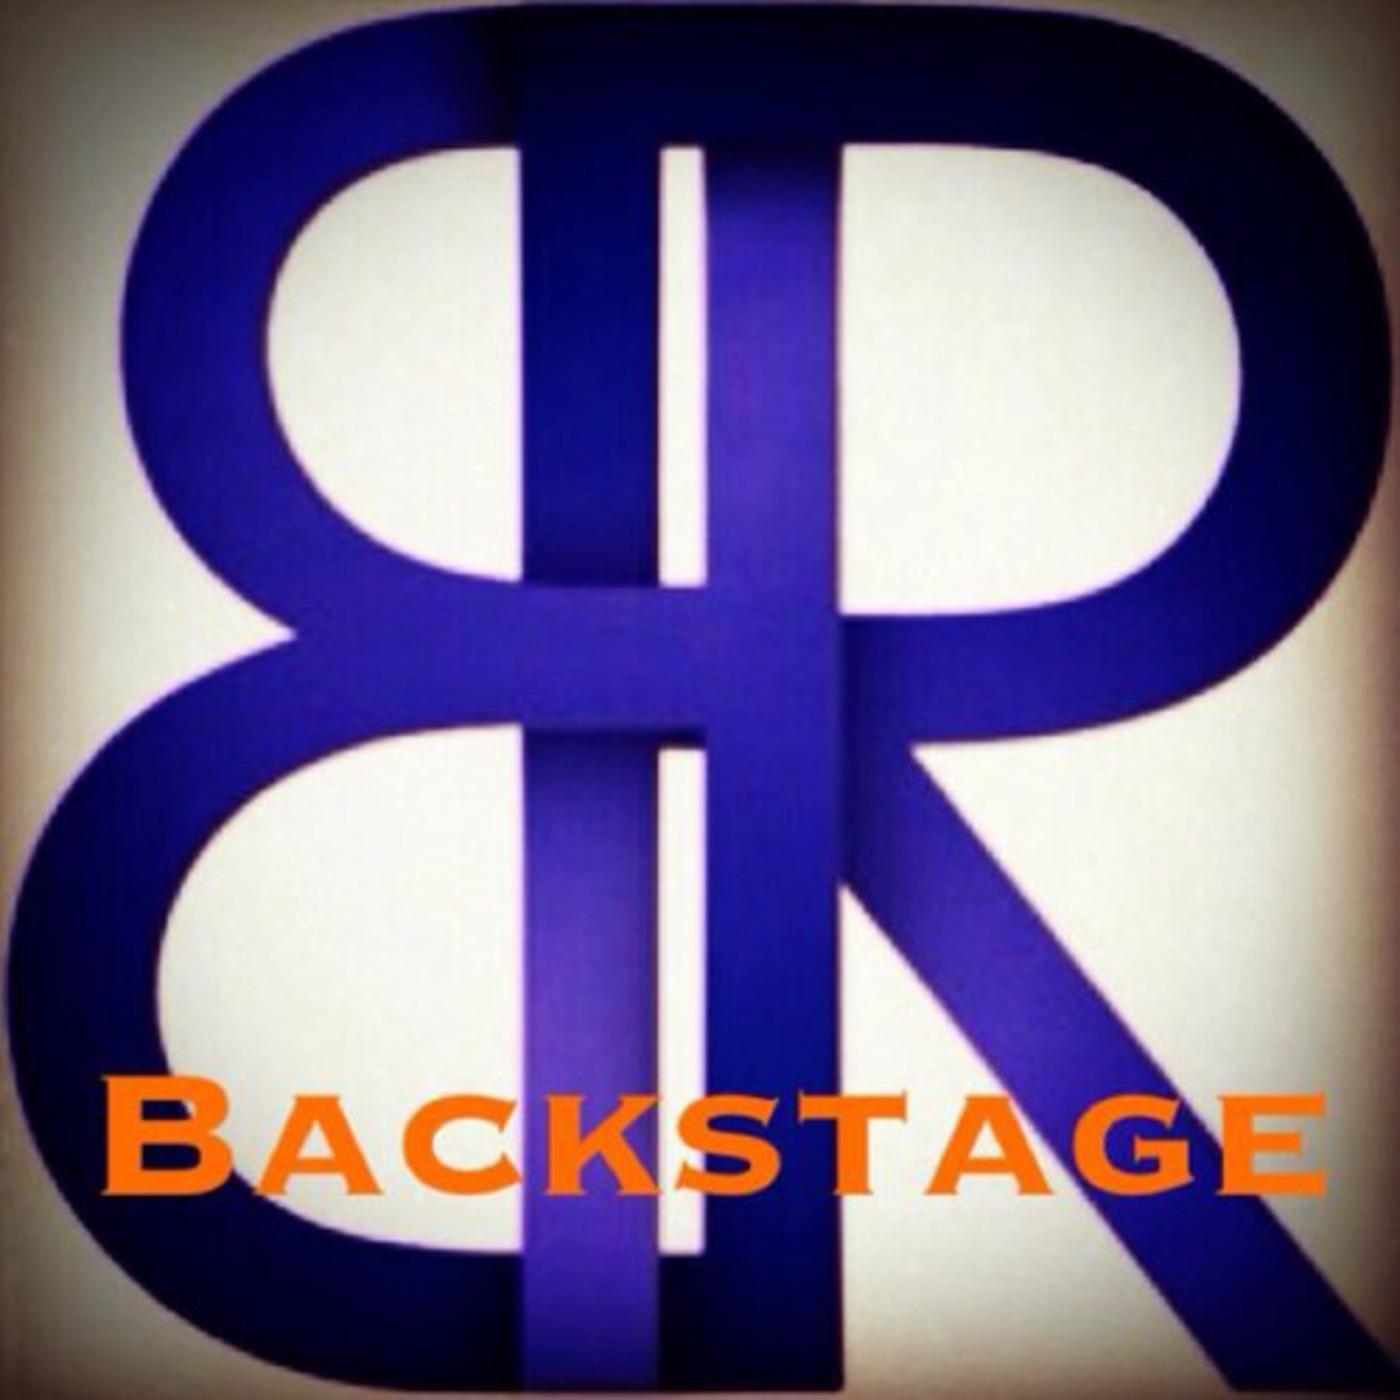 BlazinRy Backstage: Specials